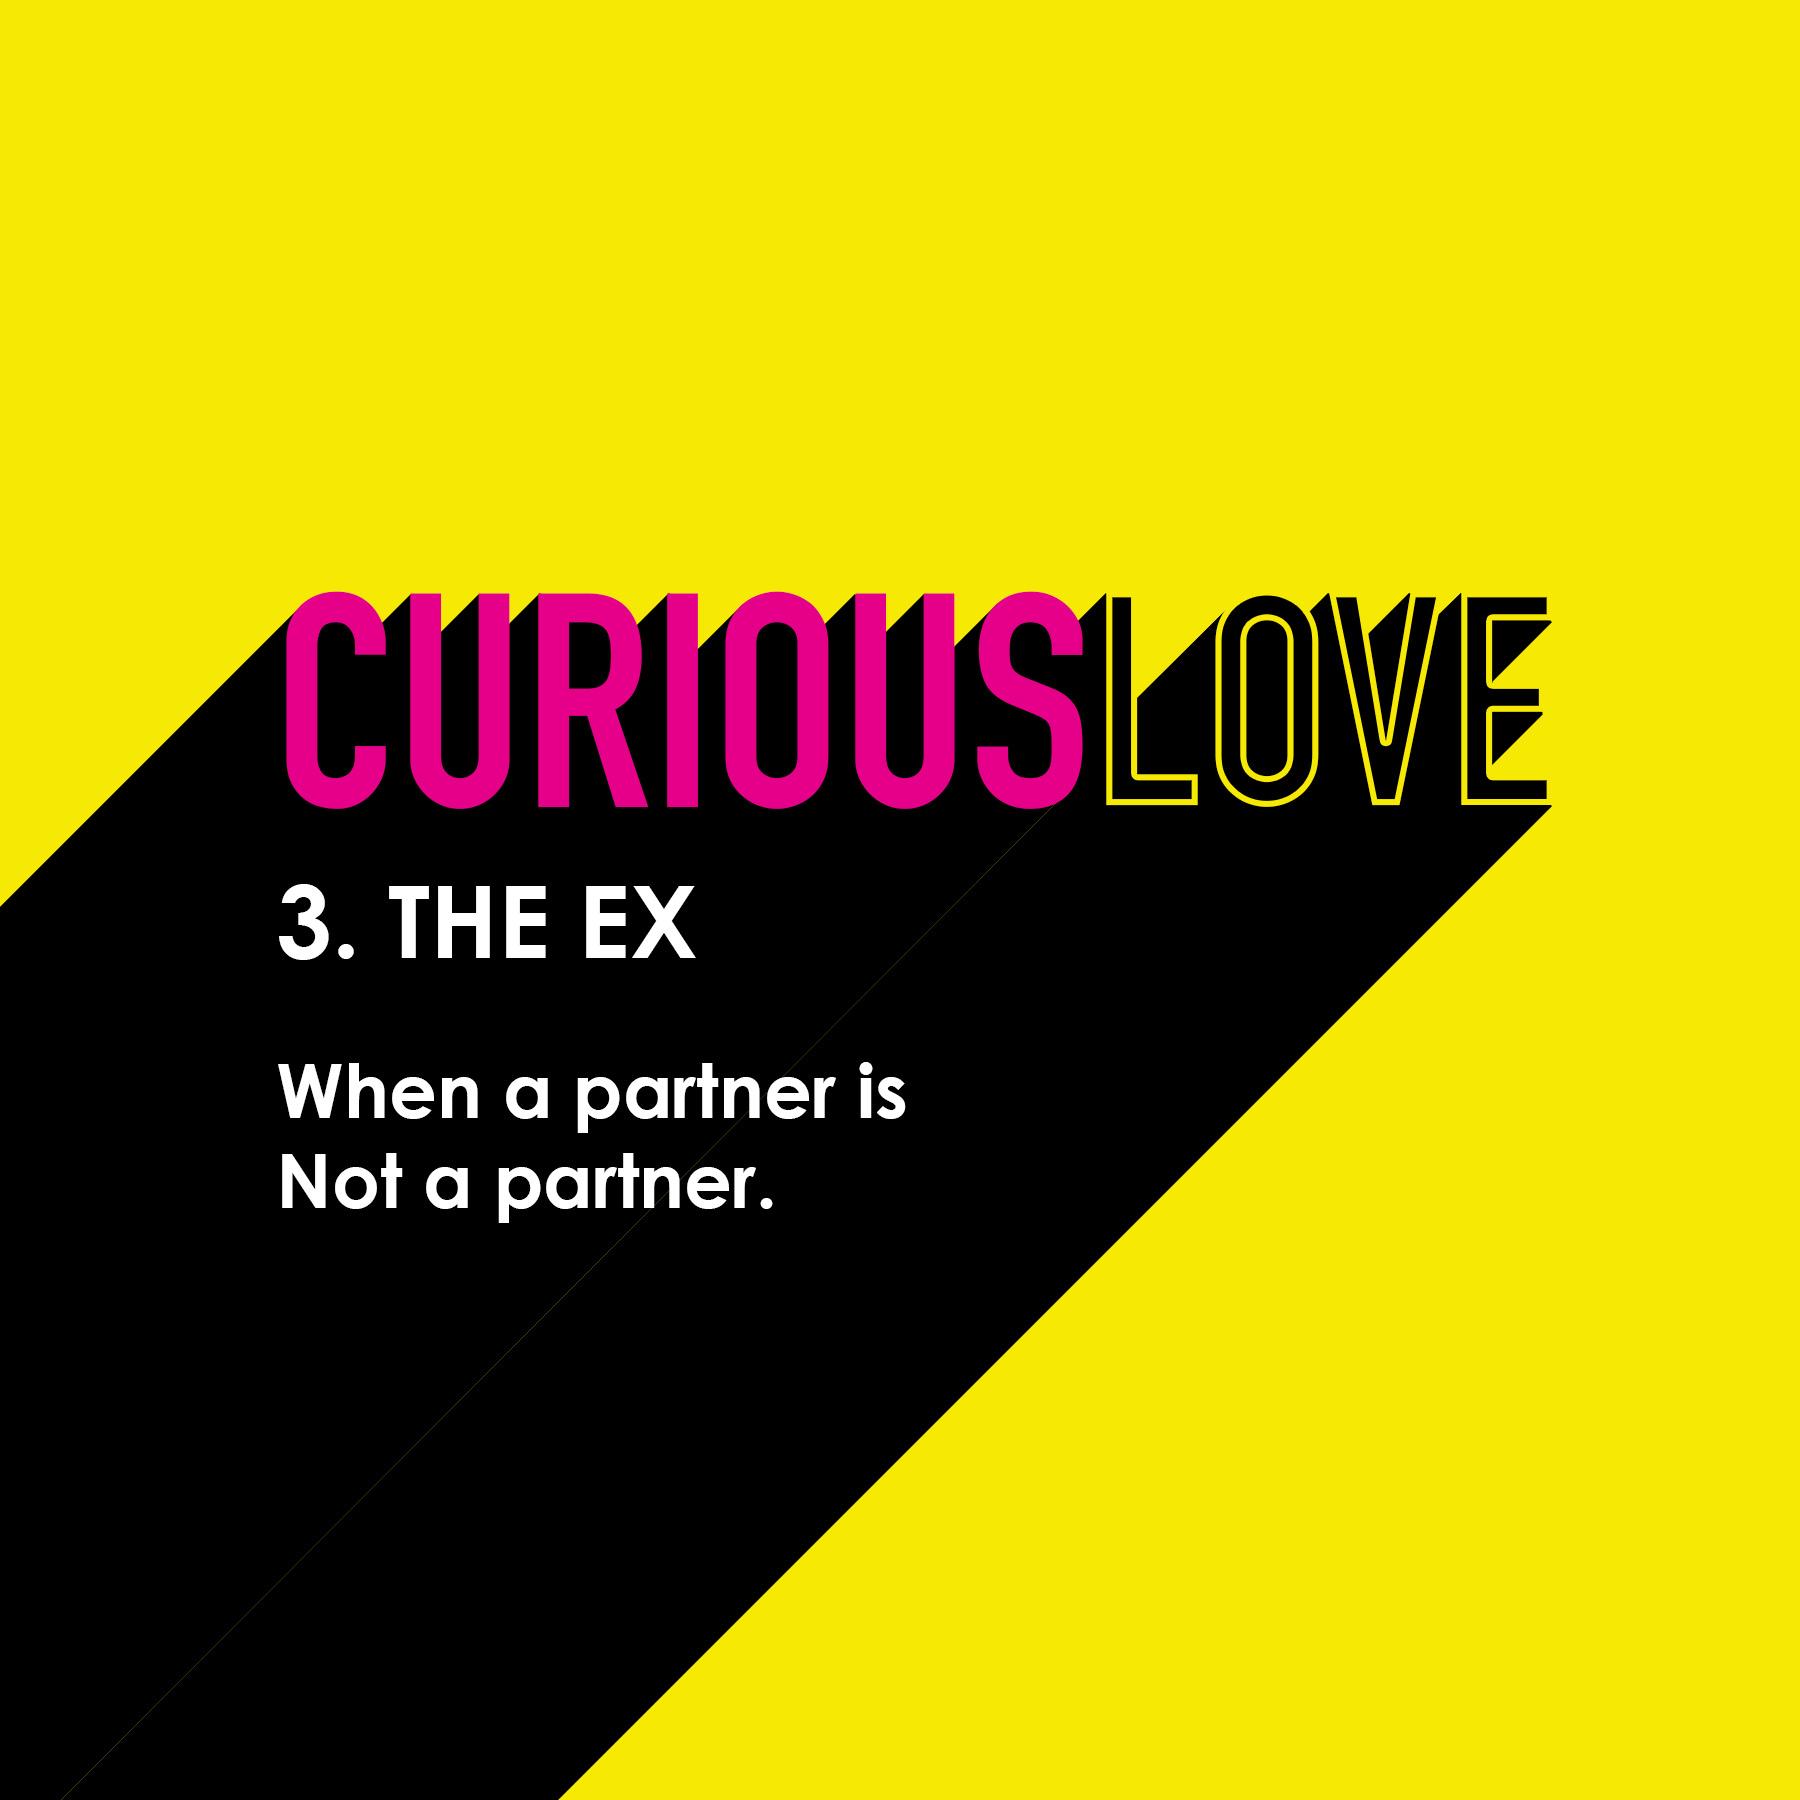 CuriousLove Episode Tagline 3.jpg